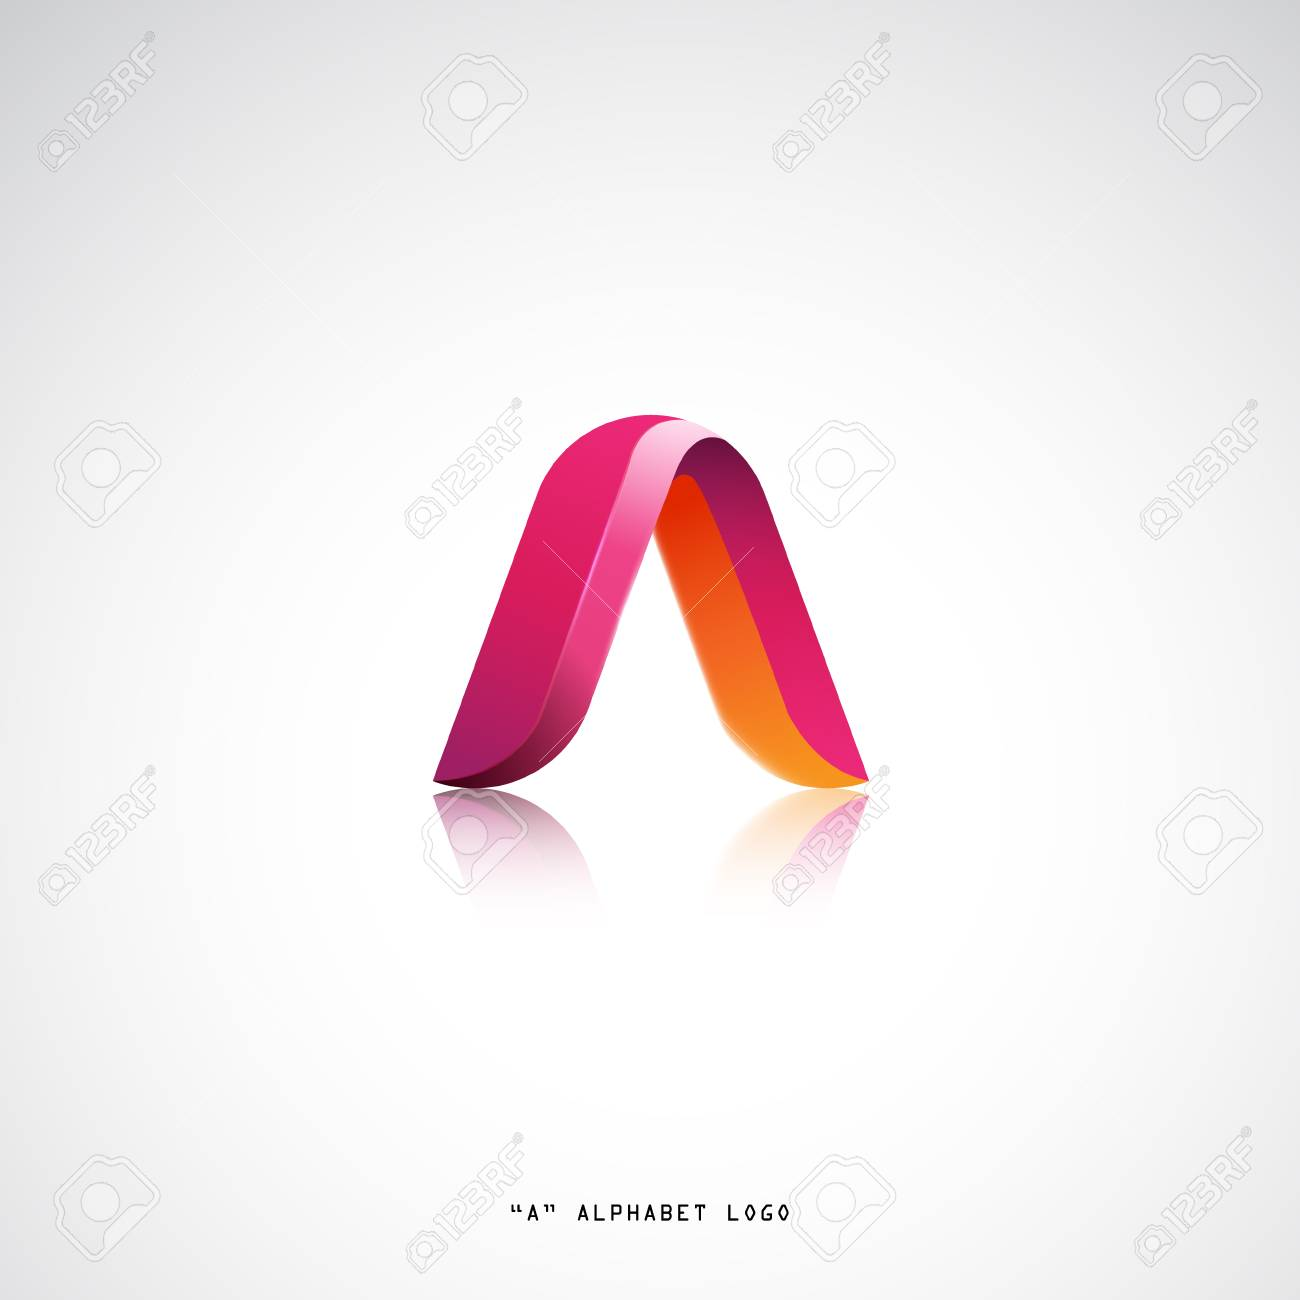 A letter alphabet business logo vector design. Modern flat style concept - 58315399